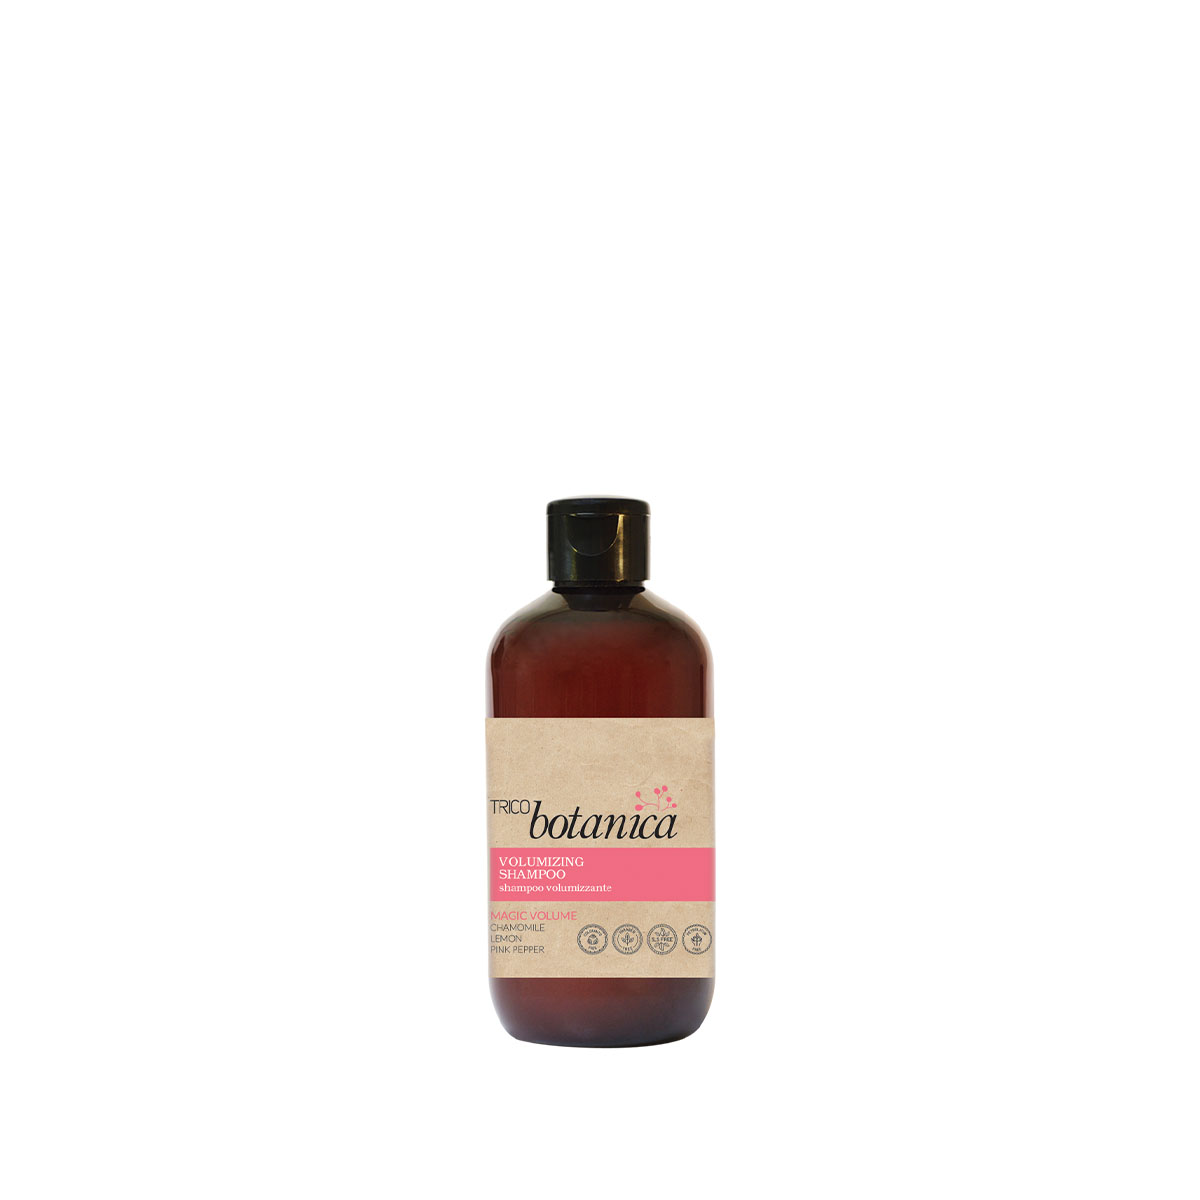 Tricobotanica volumizing shampoo 250ml SHAMPOO